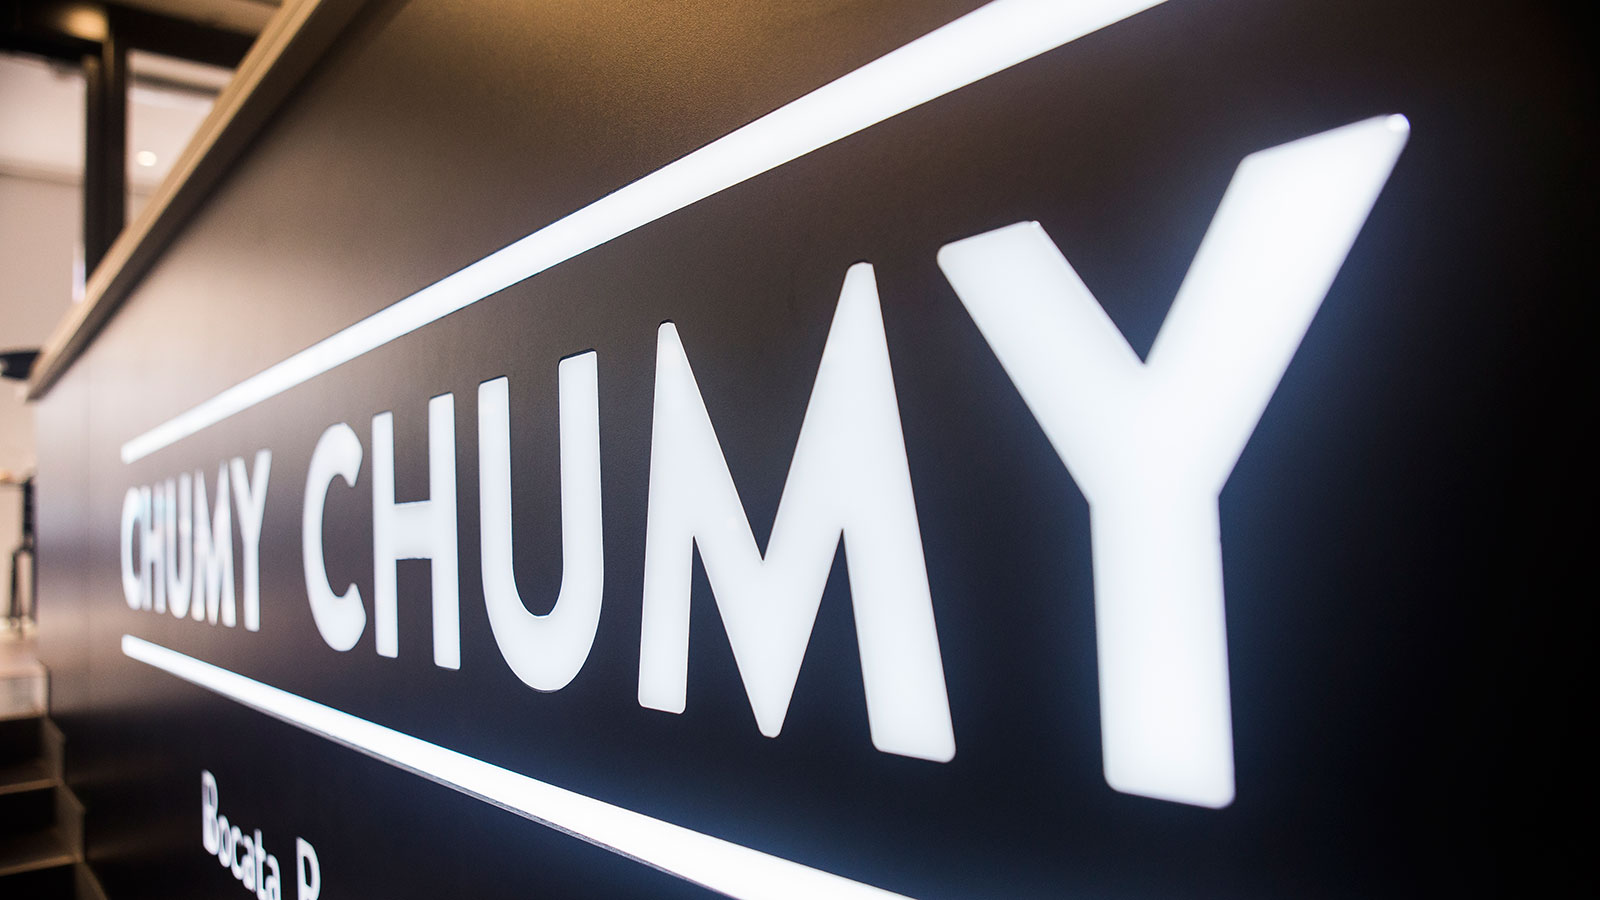 Socioººº - Chumy Chumy - Video publicitario